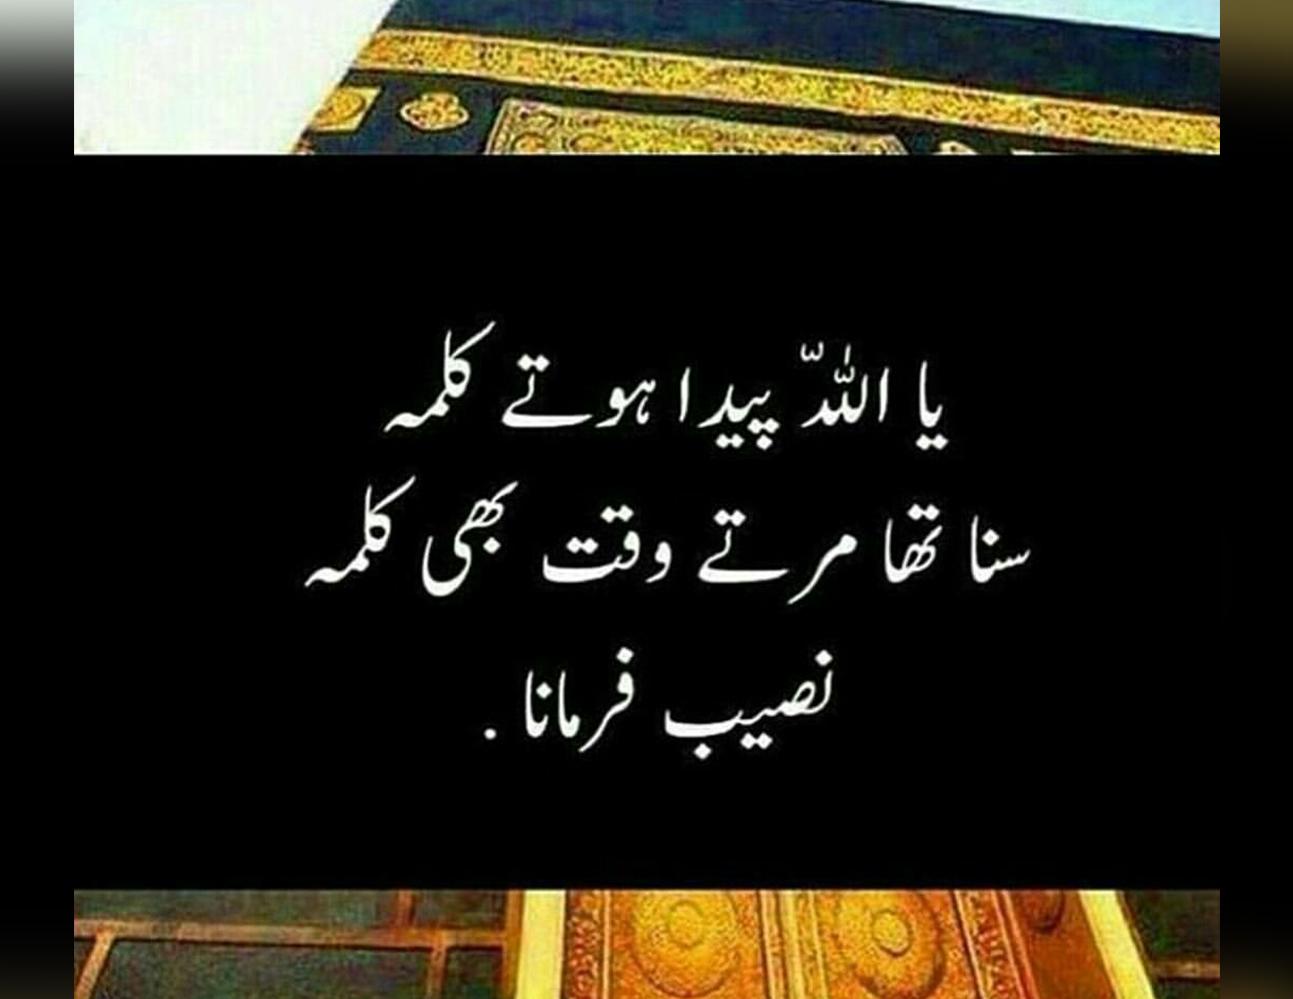 Beautiful Saying Quotes in Urdu Wallpapers Photos - Urdu ...